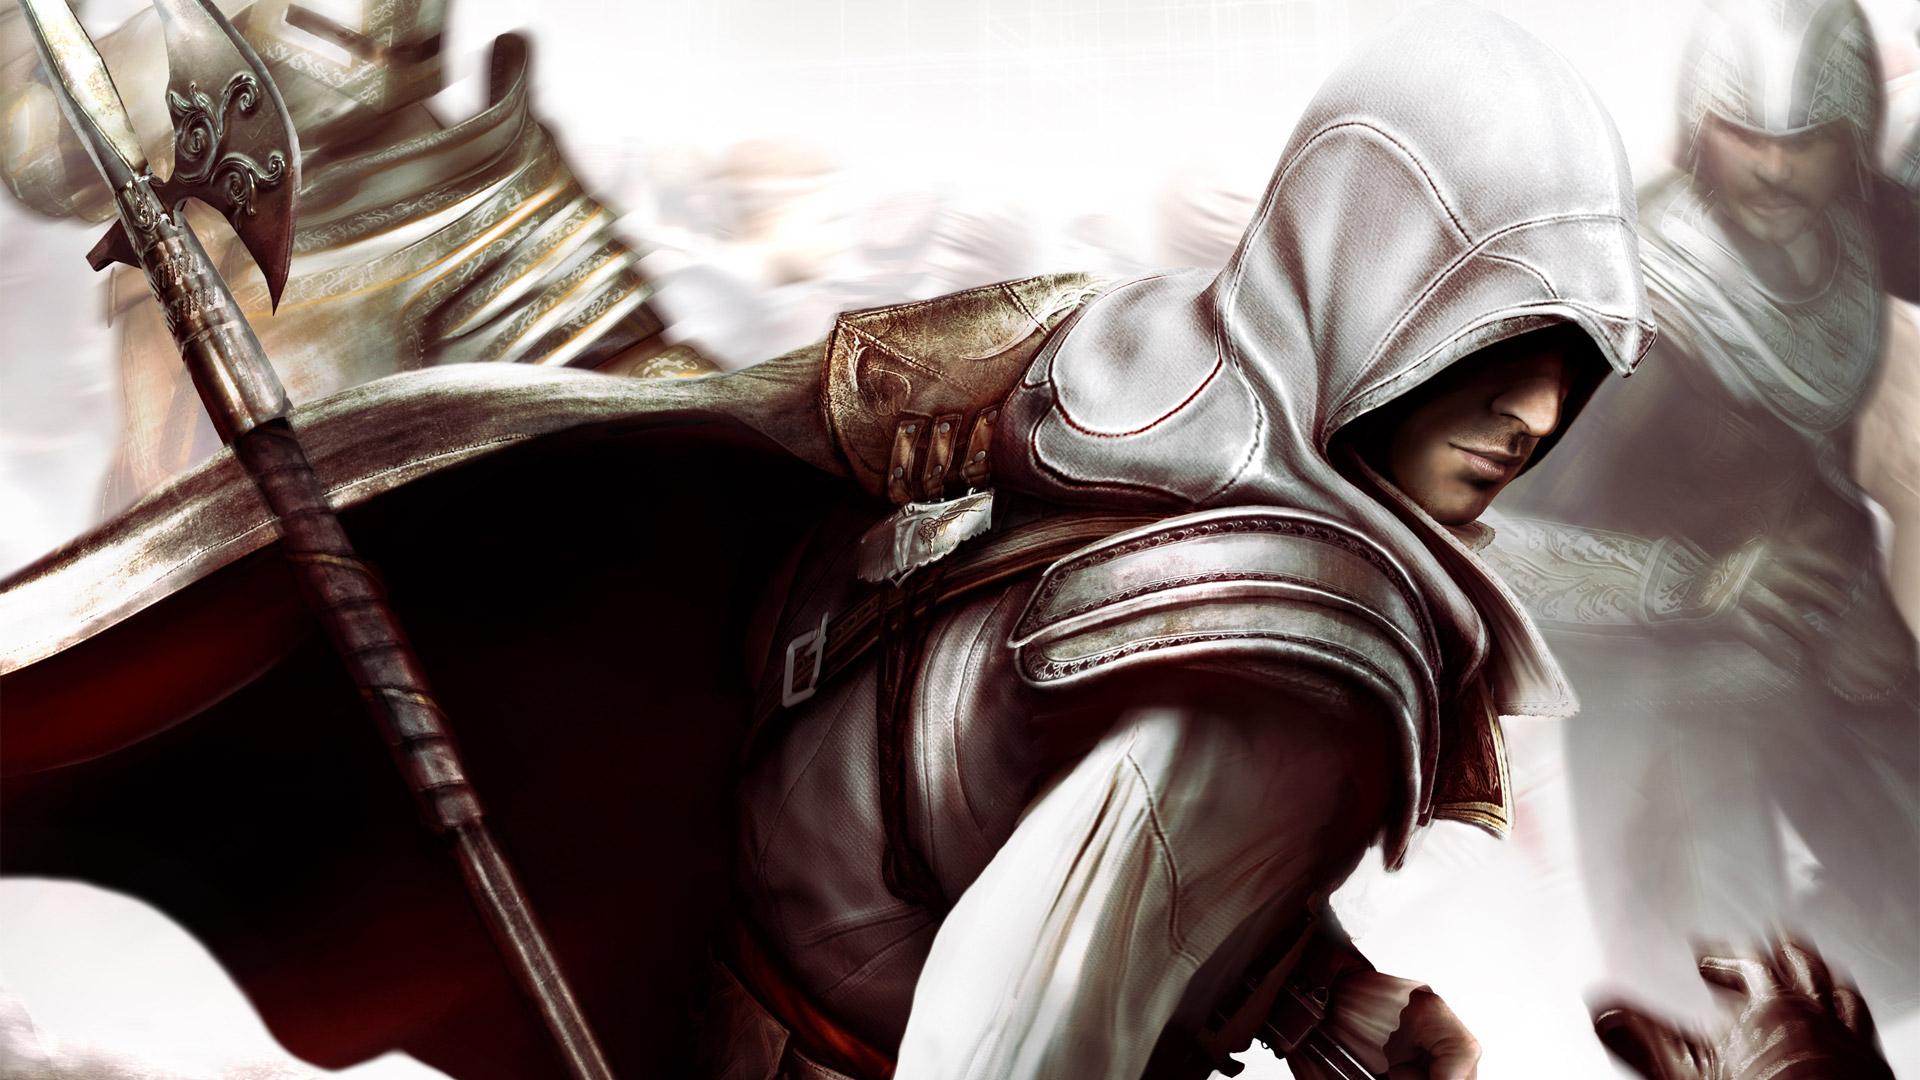 Assassin's Creed II Wallpaper in 1920x1080